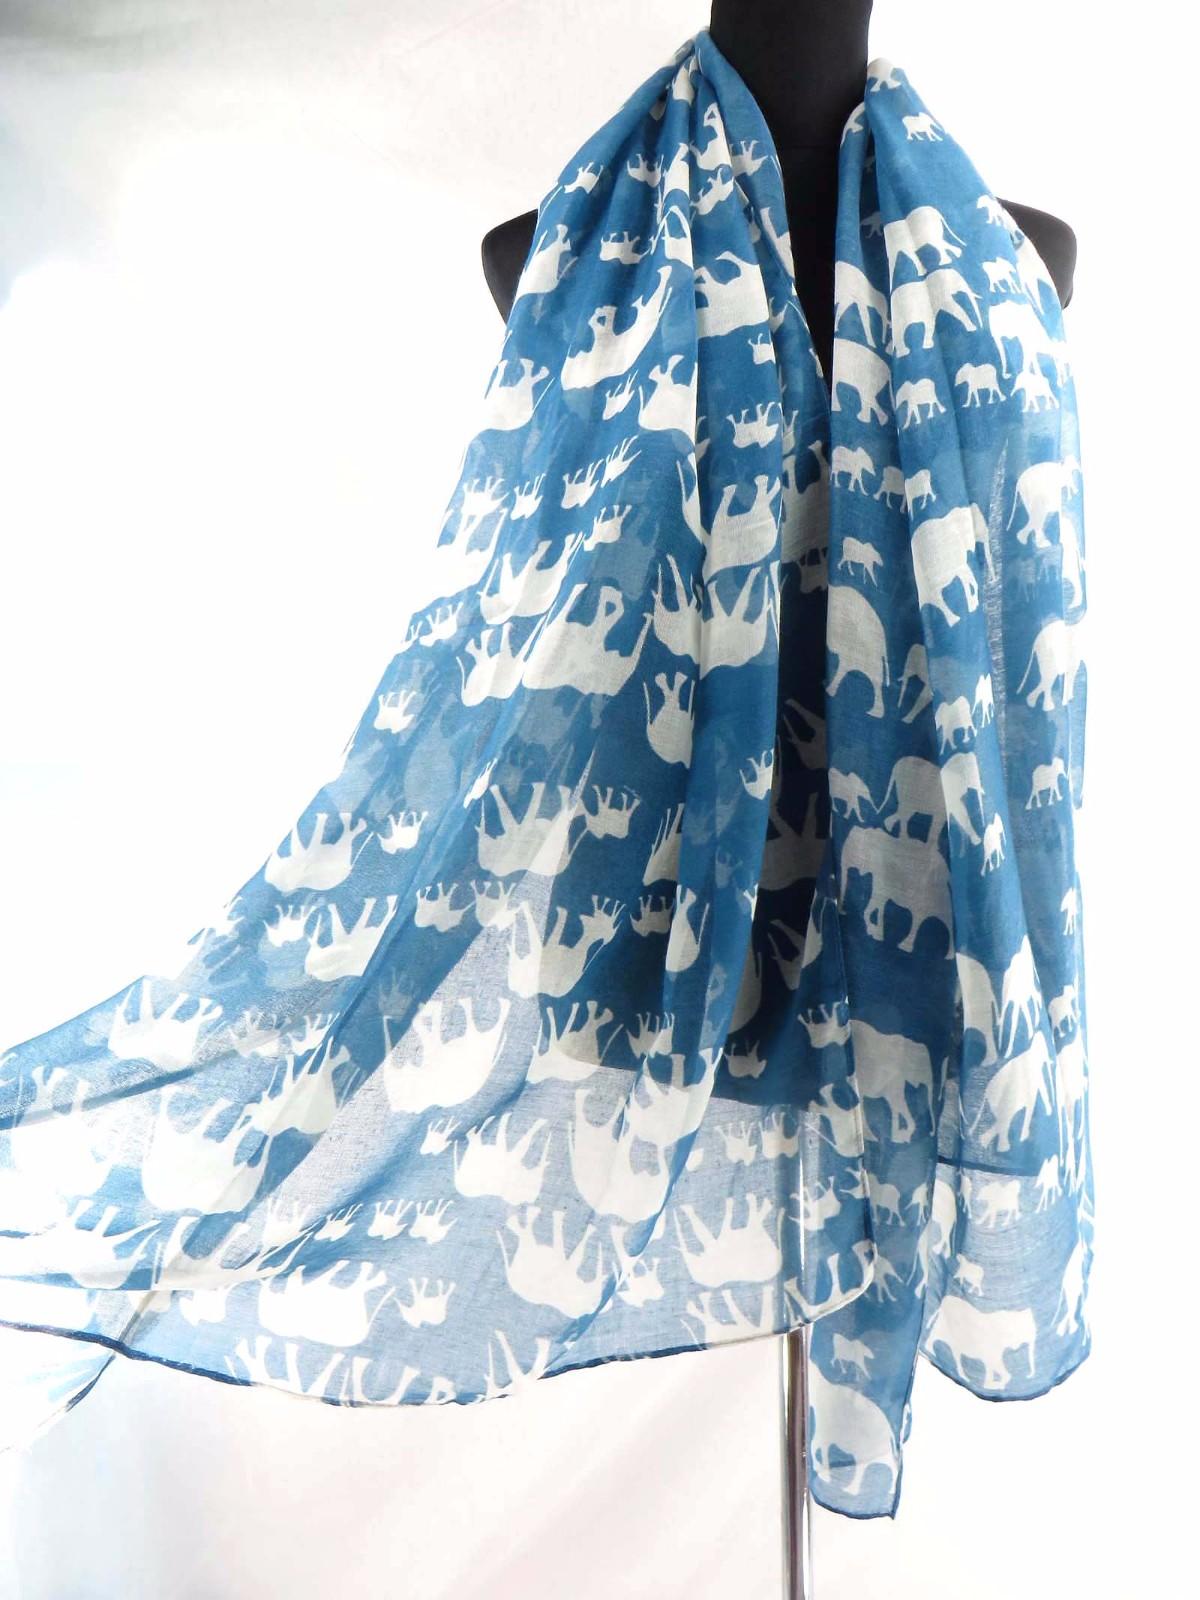 swimwear cover up lucky elephant animal large scarf beach sarong US SELLER